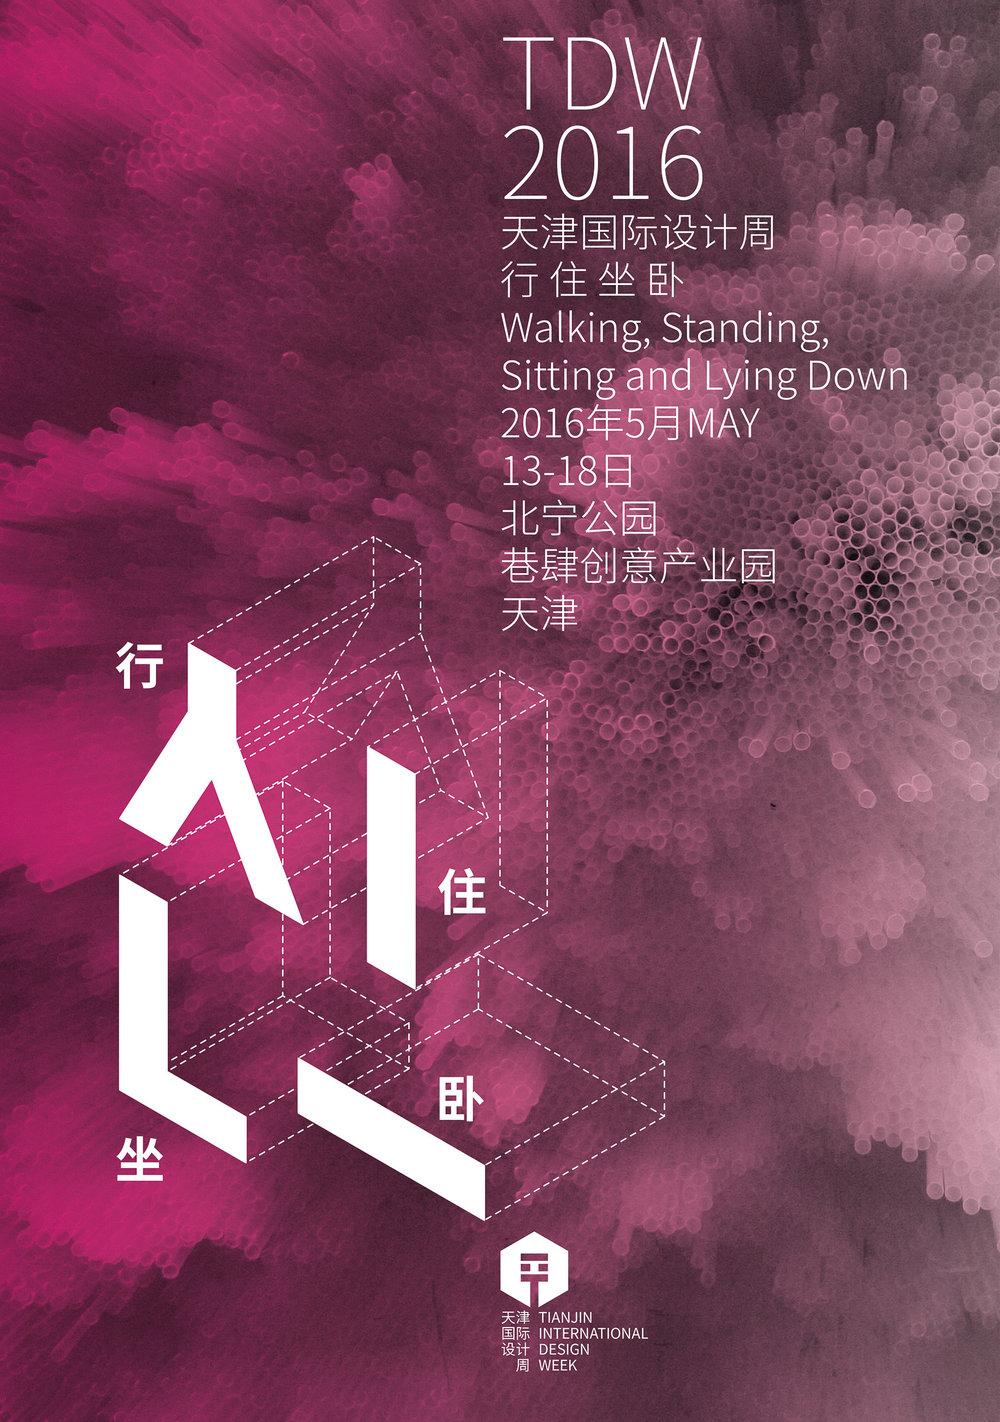 TDW2016_poster_EXE_web.jpg